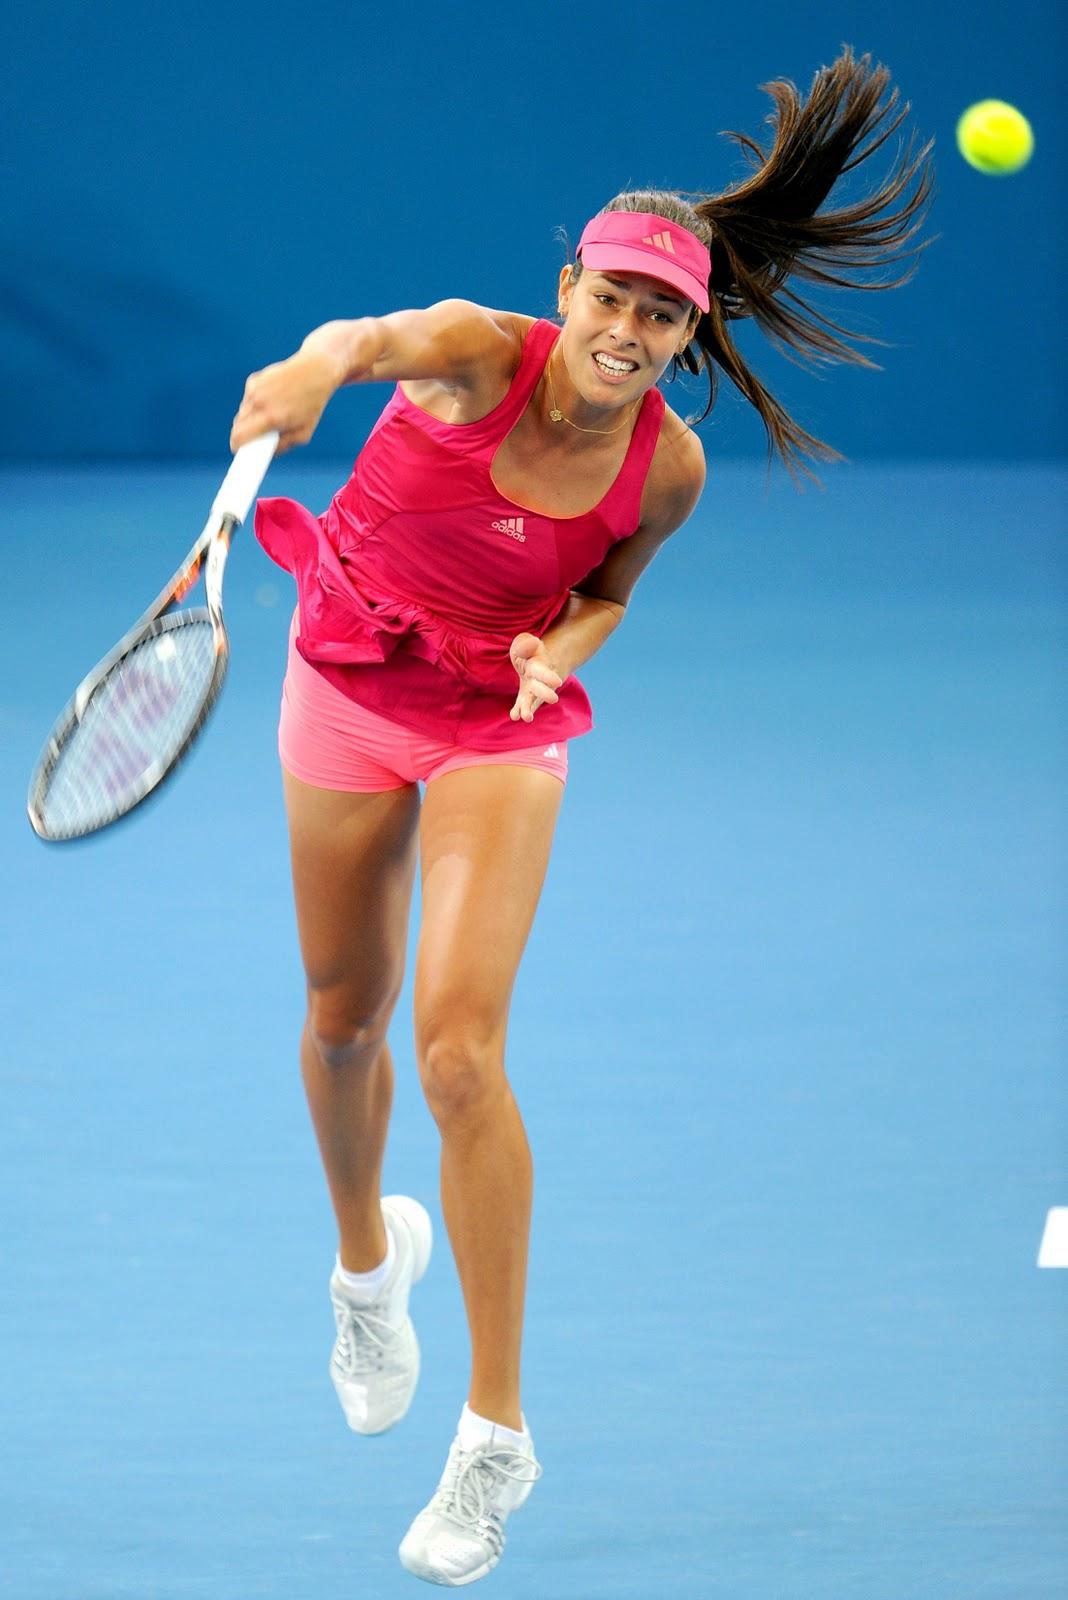 Ana Ivanovics Upskirt Shots in Brisbane International